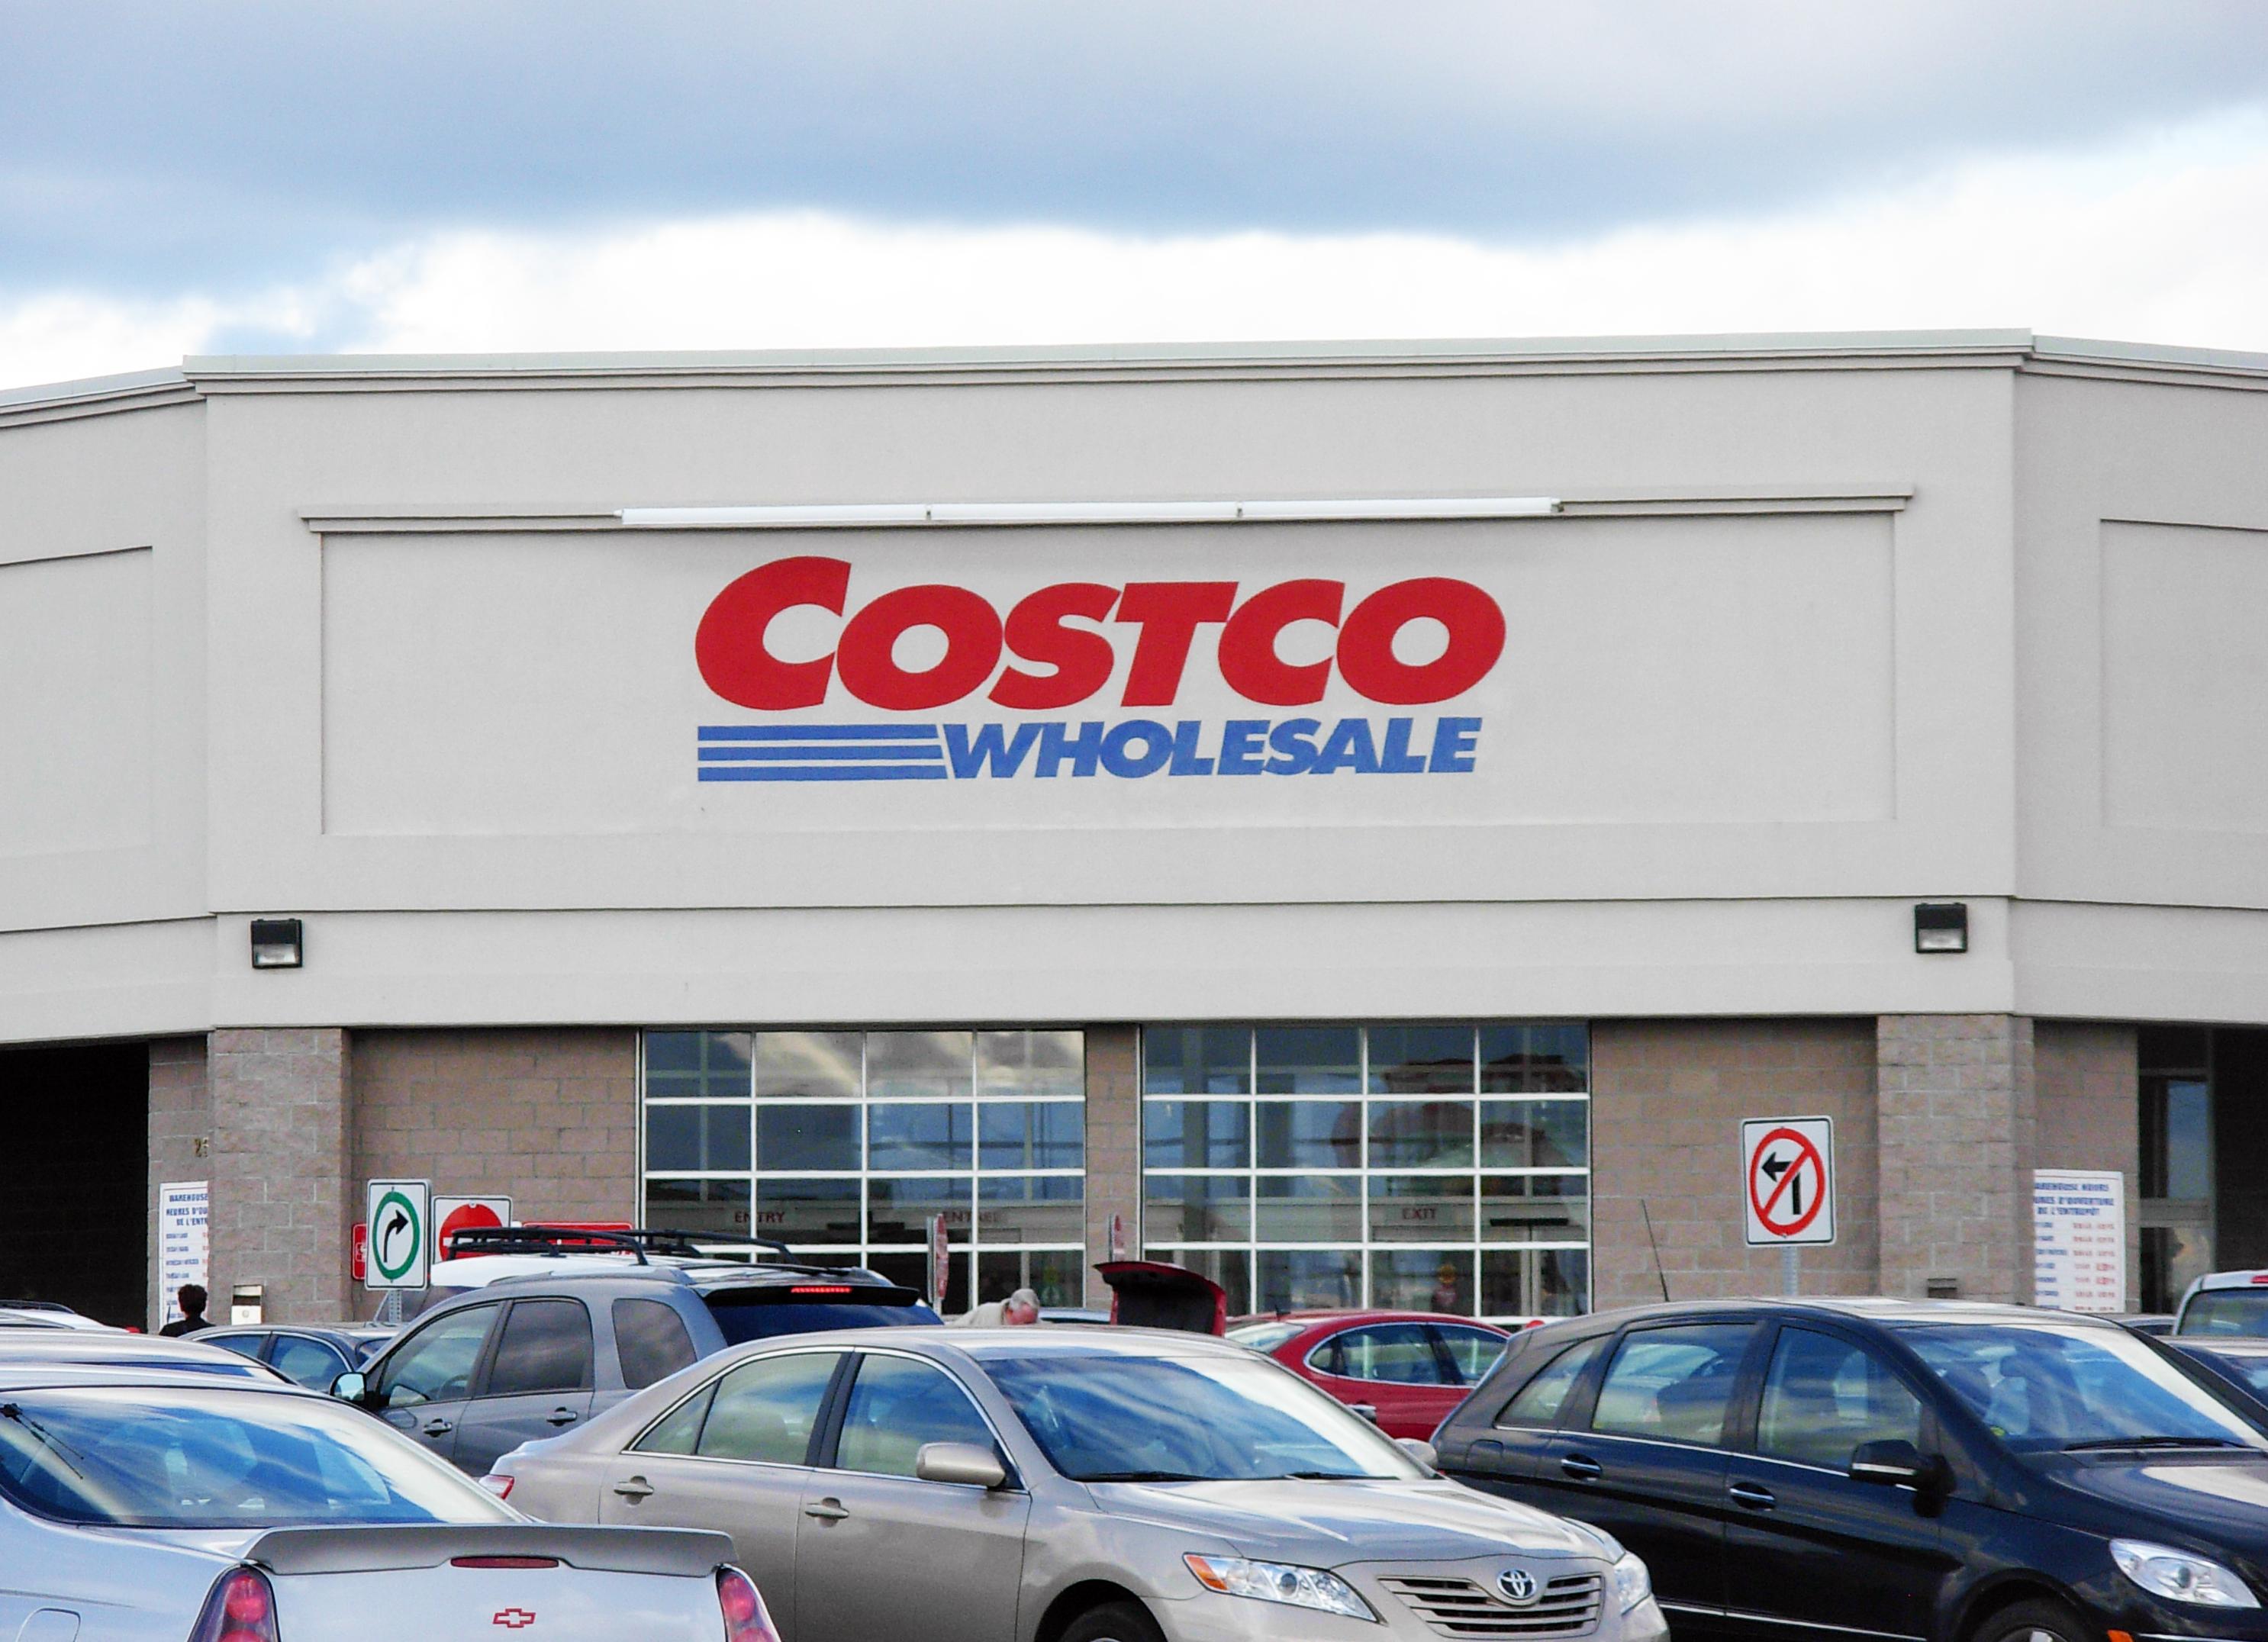 Costco Wins My Heart